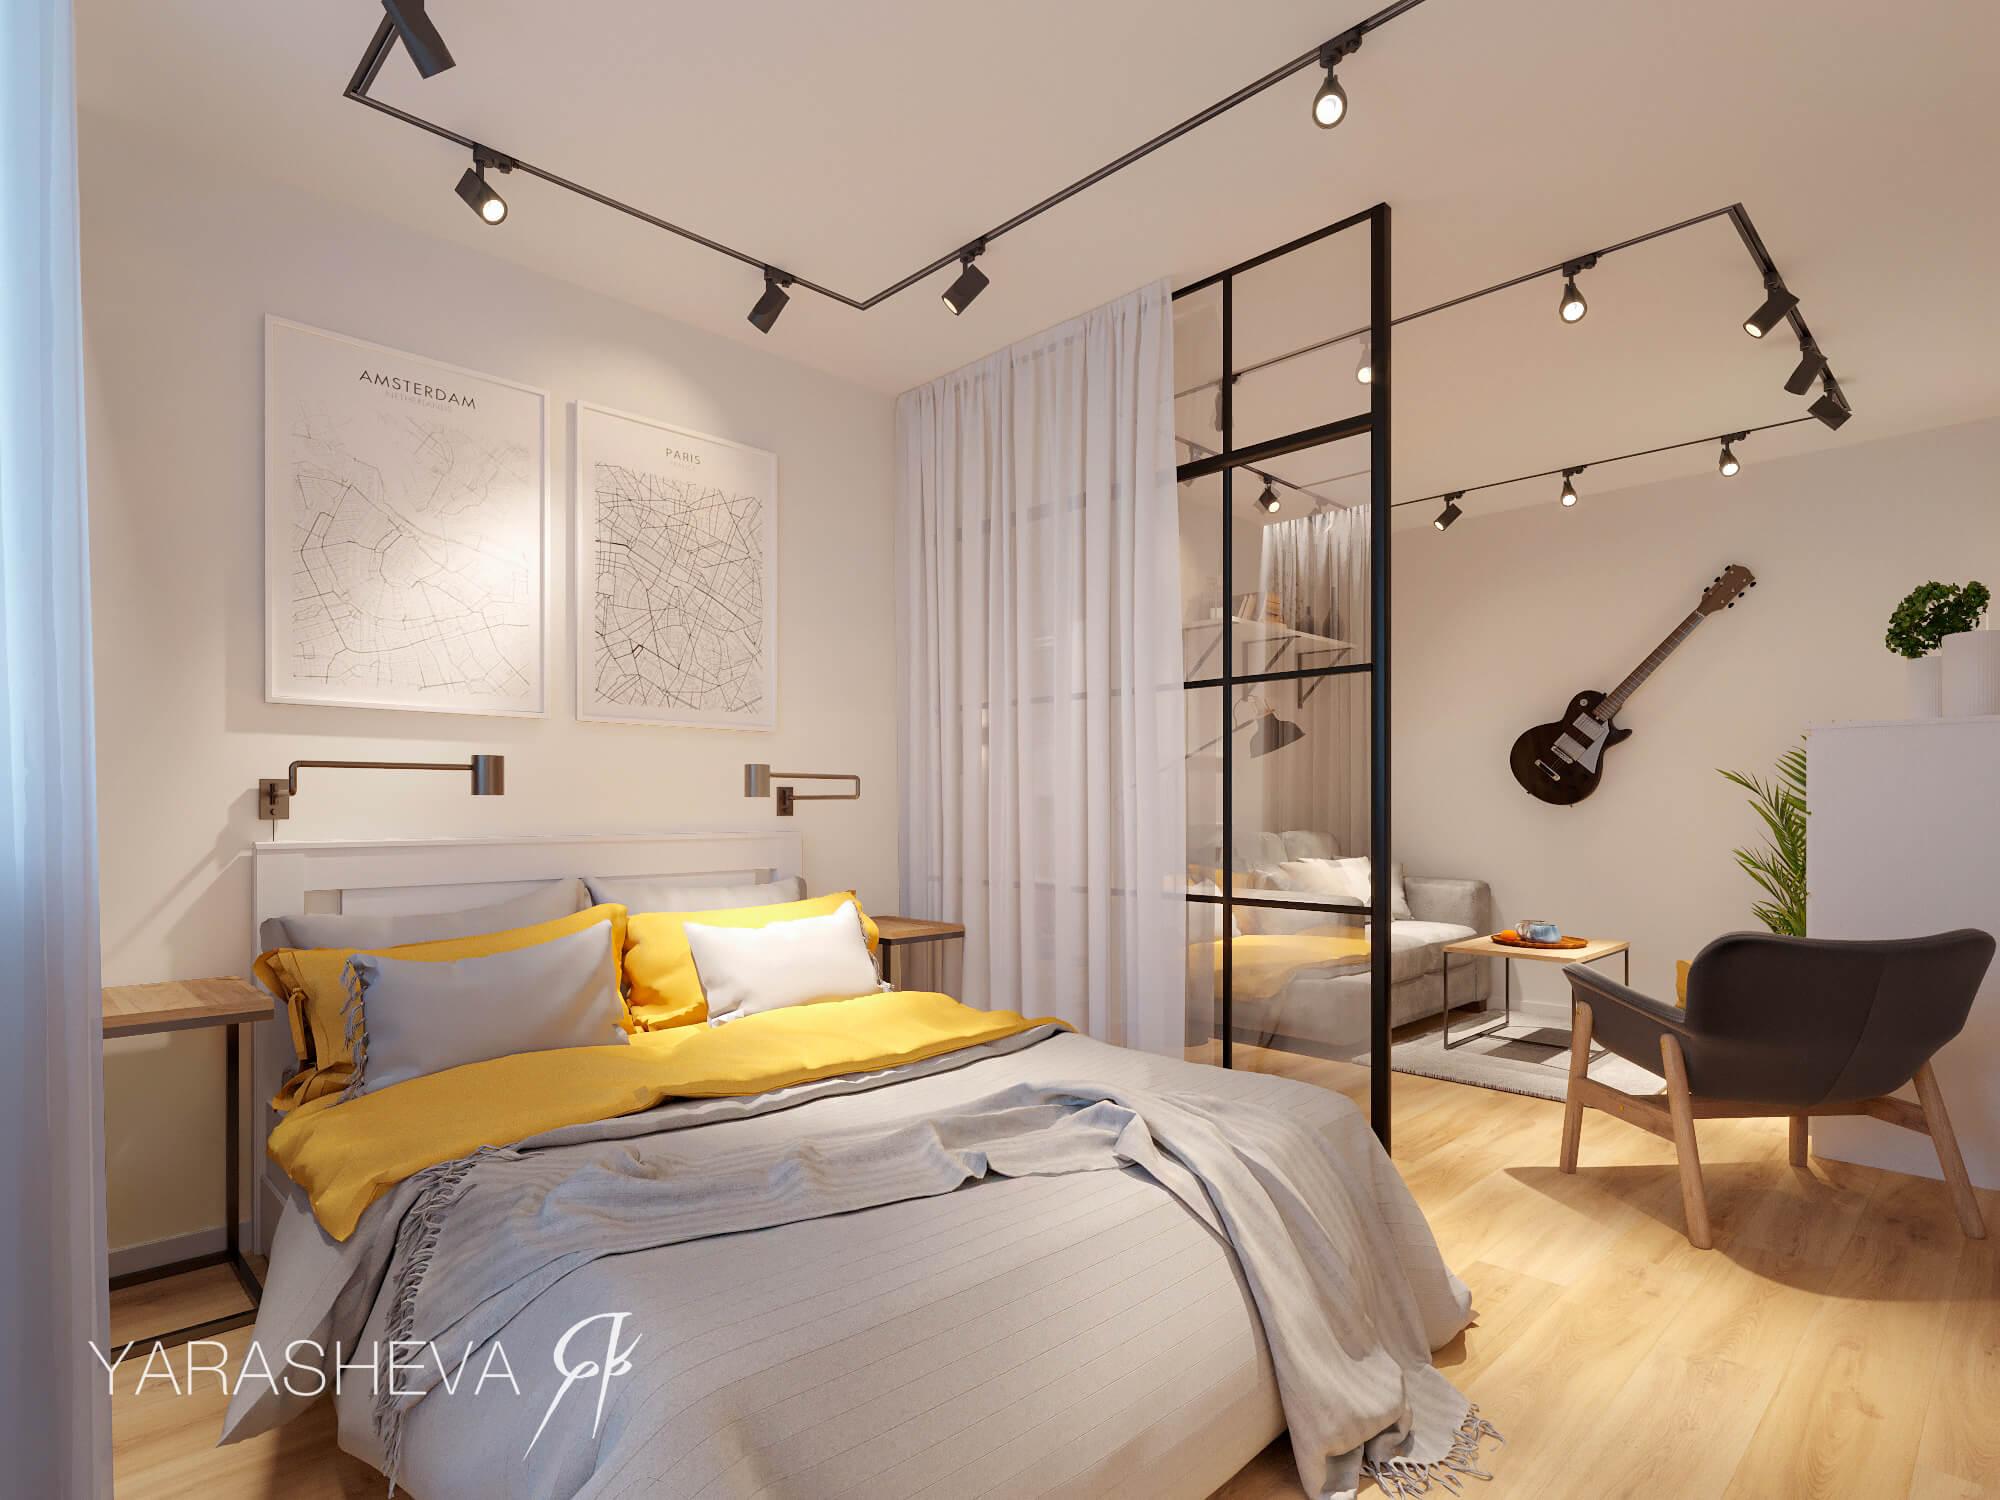 interior design of the living room-bedroom